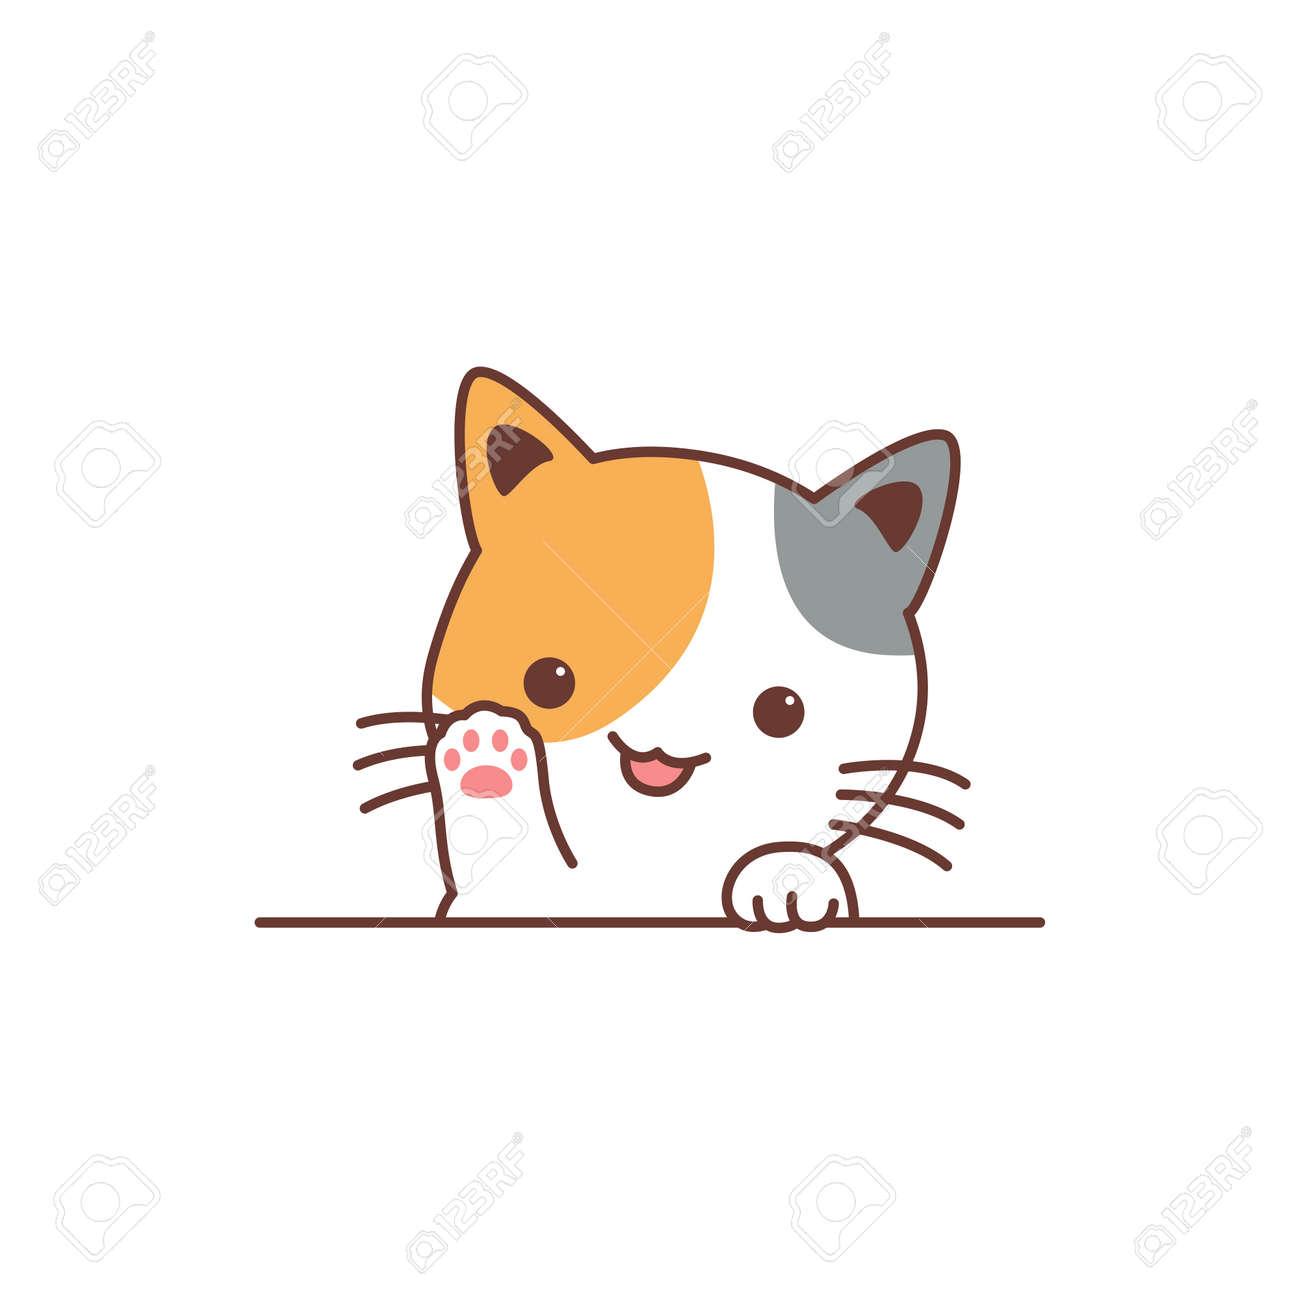 Cute three color cat waving paw cartoon, vector illustration - 169153208